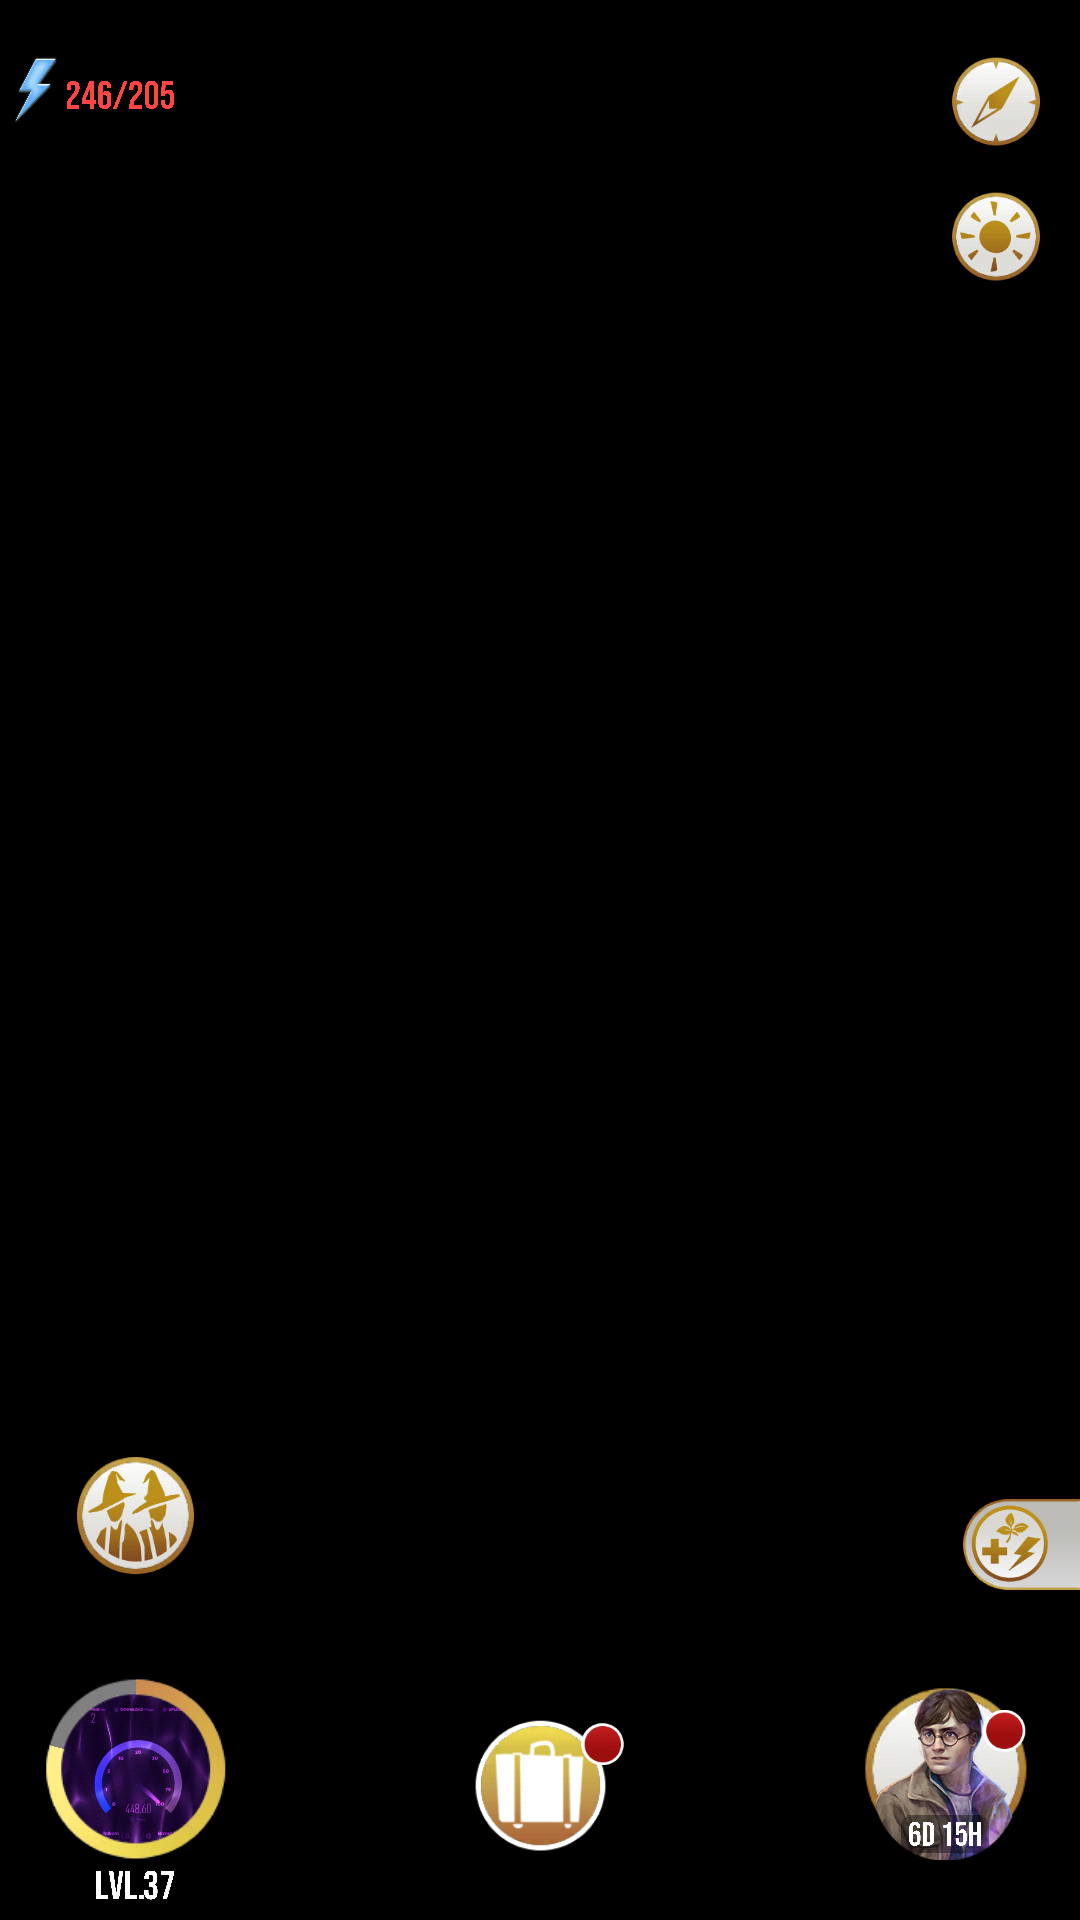 Screenshot_2020-09-23-09-24-11-140_com.nianticlabs.hpwu.prod.png